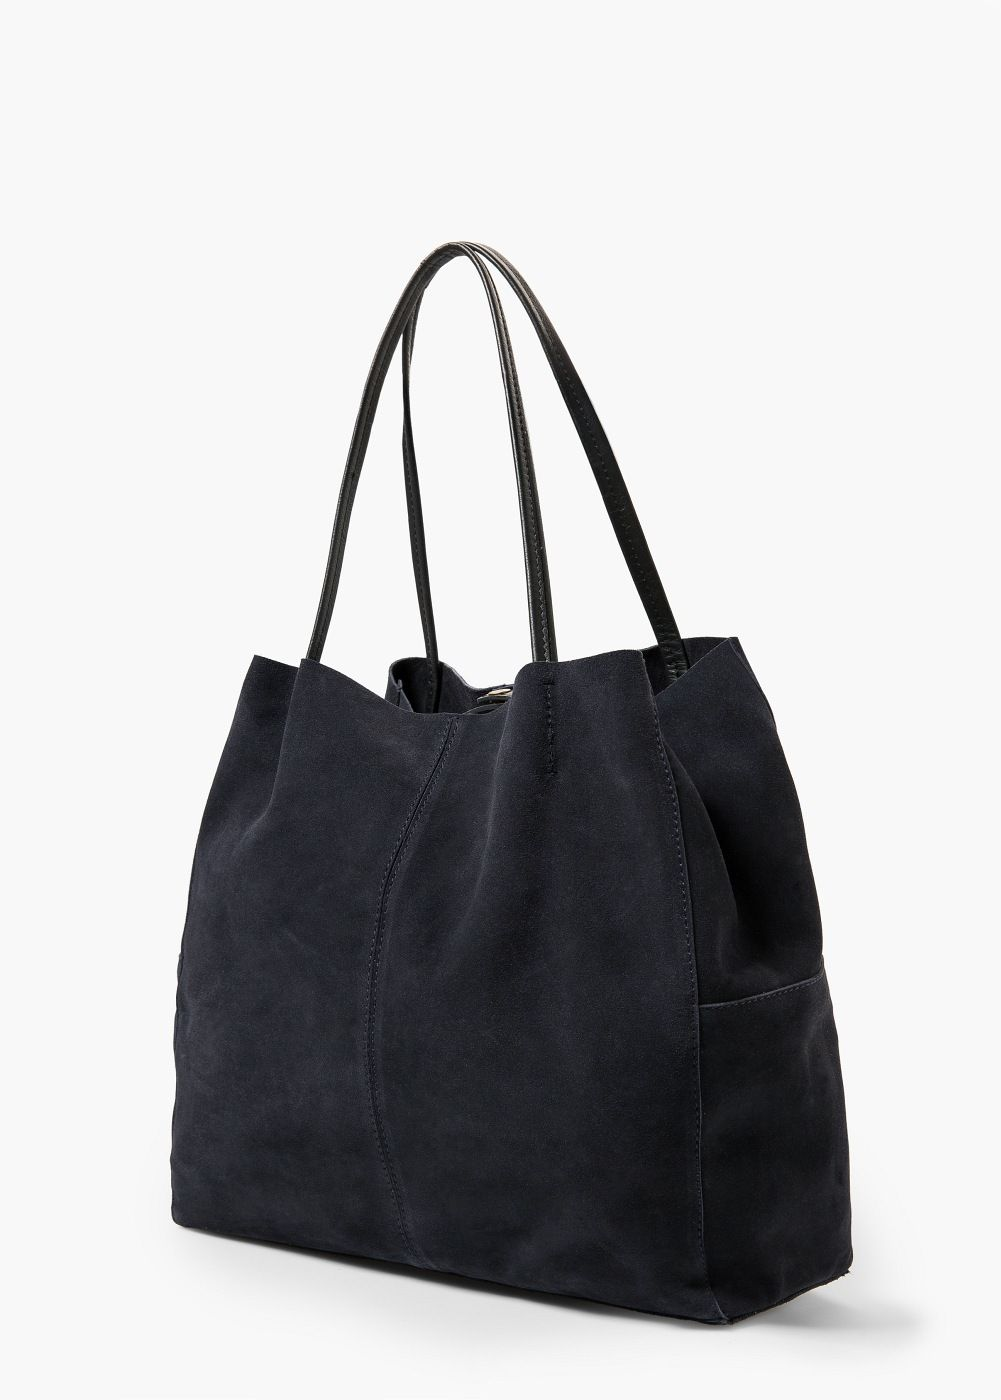 Suede Shopper Bag Women Mango Usa Mode Väskor Väskor Tygkasse